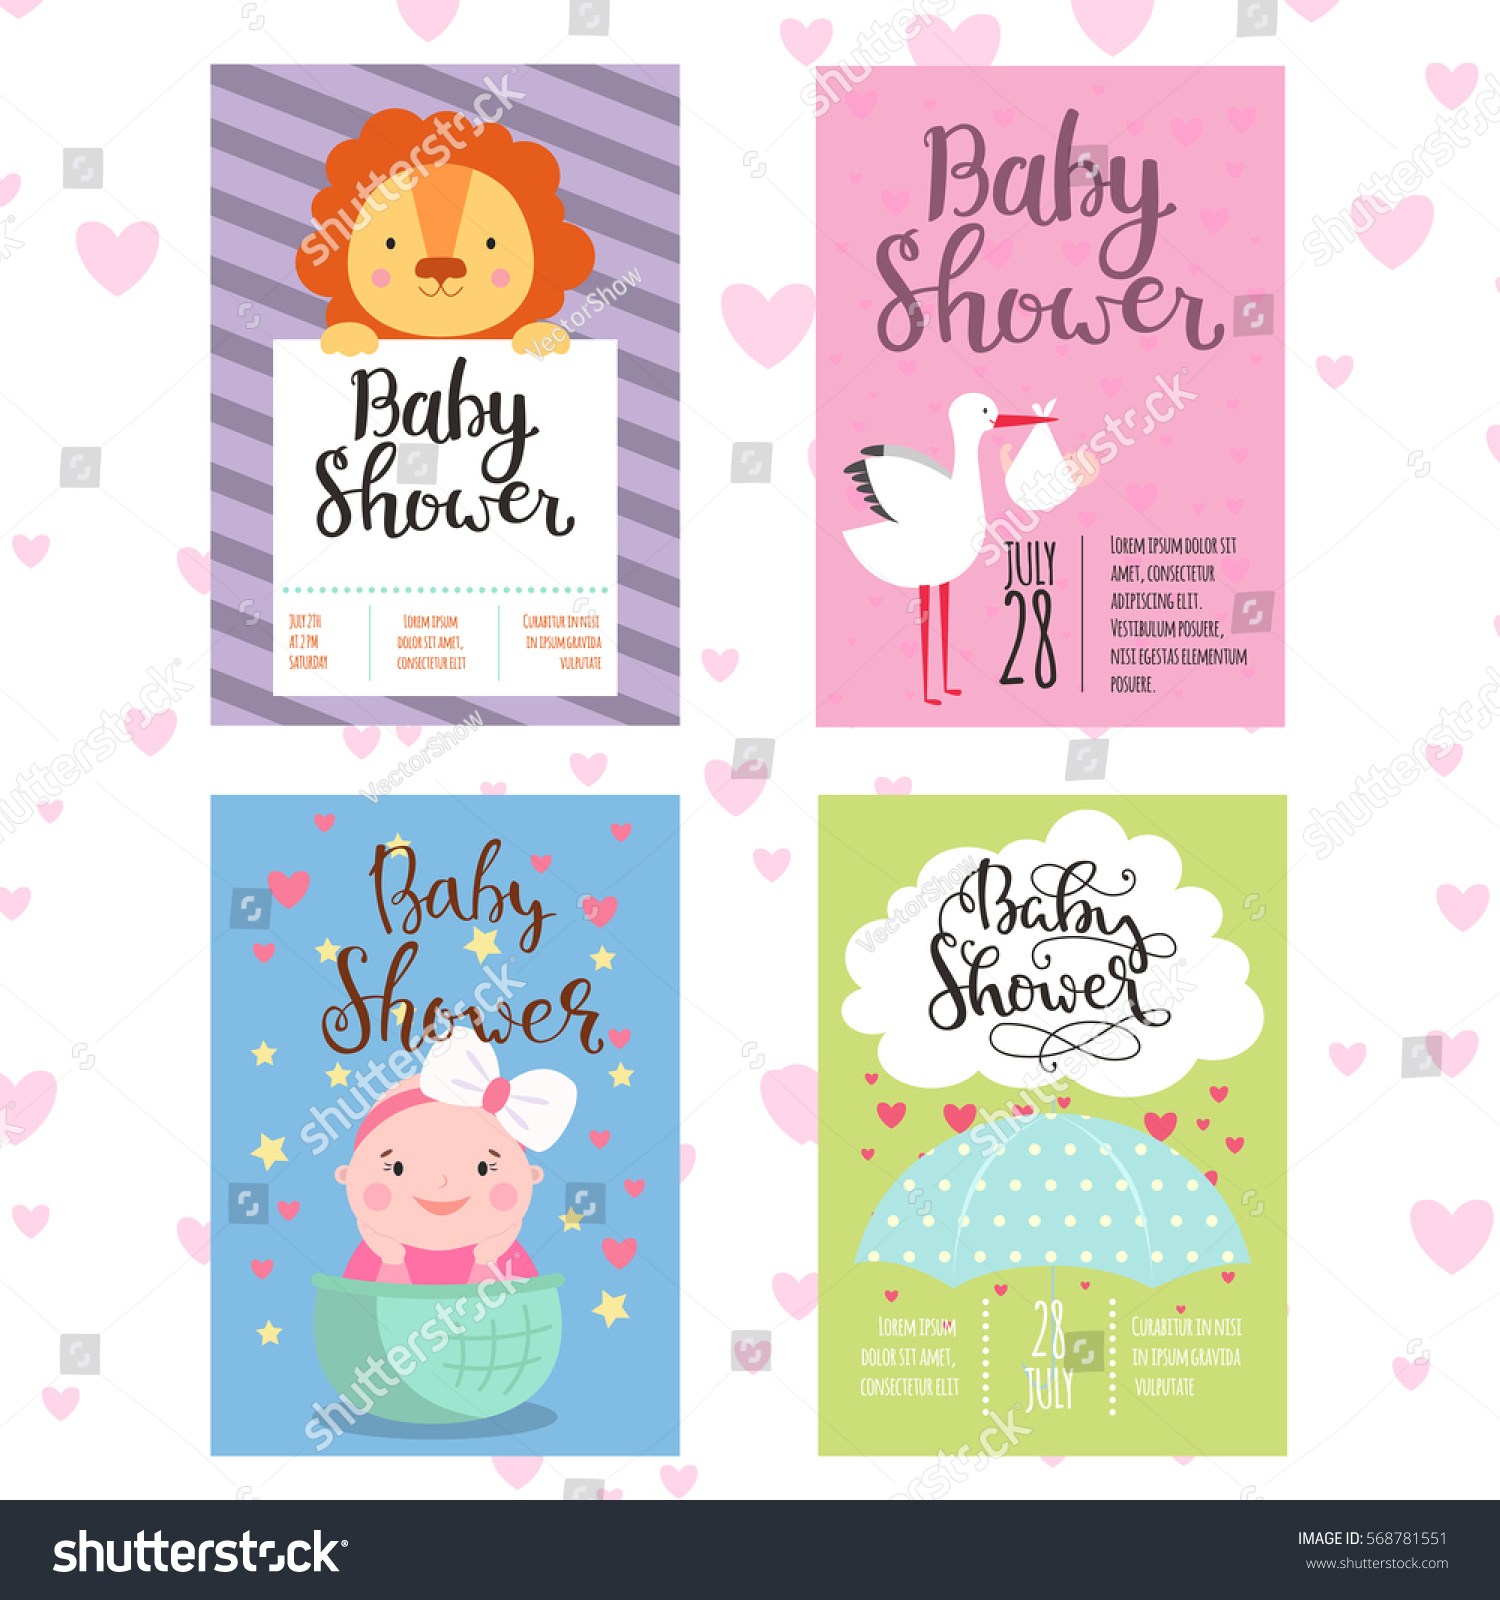 Baby Shower Invitation Vector Card Stock Vector